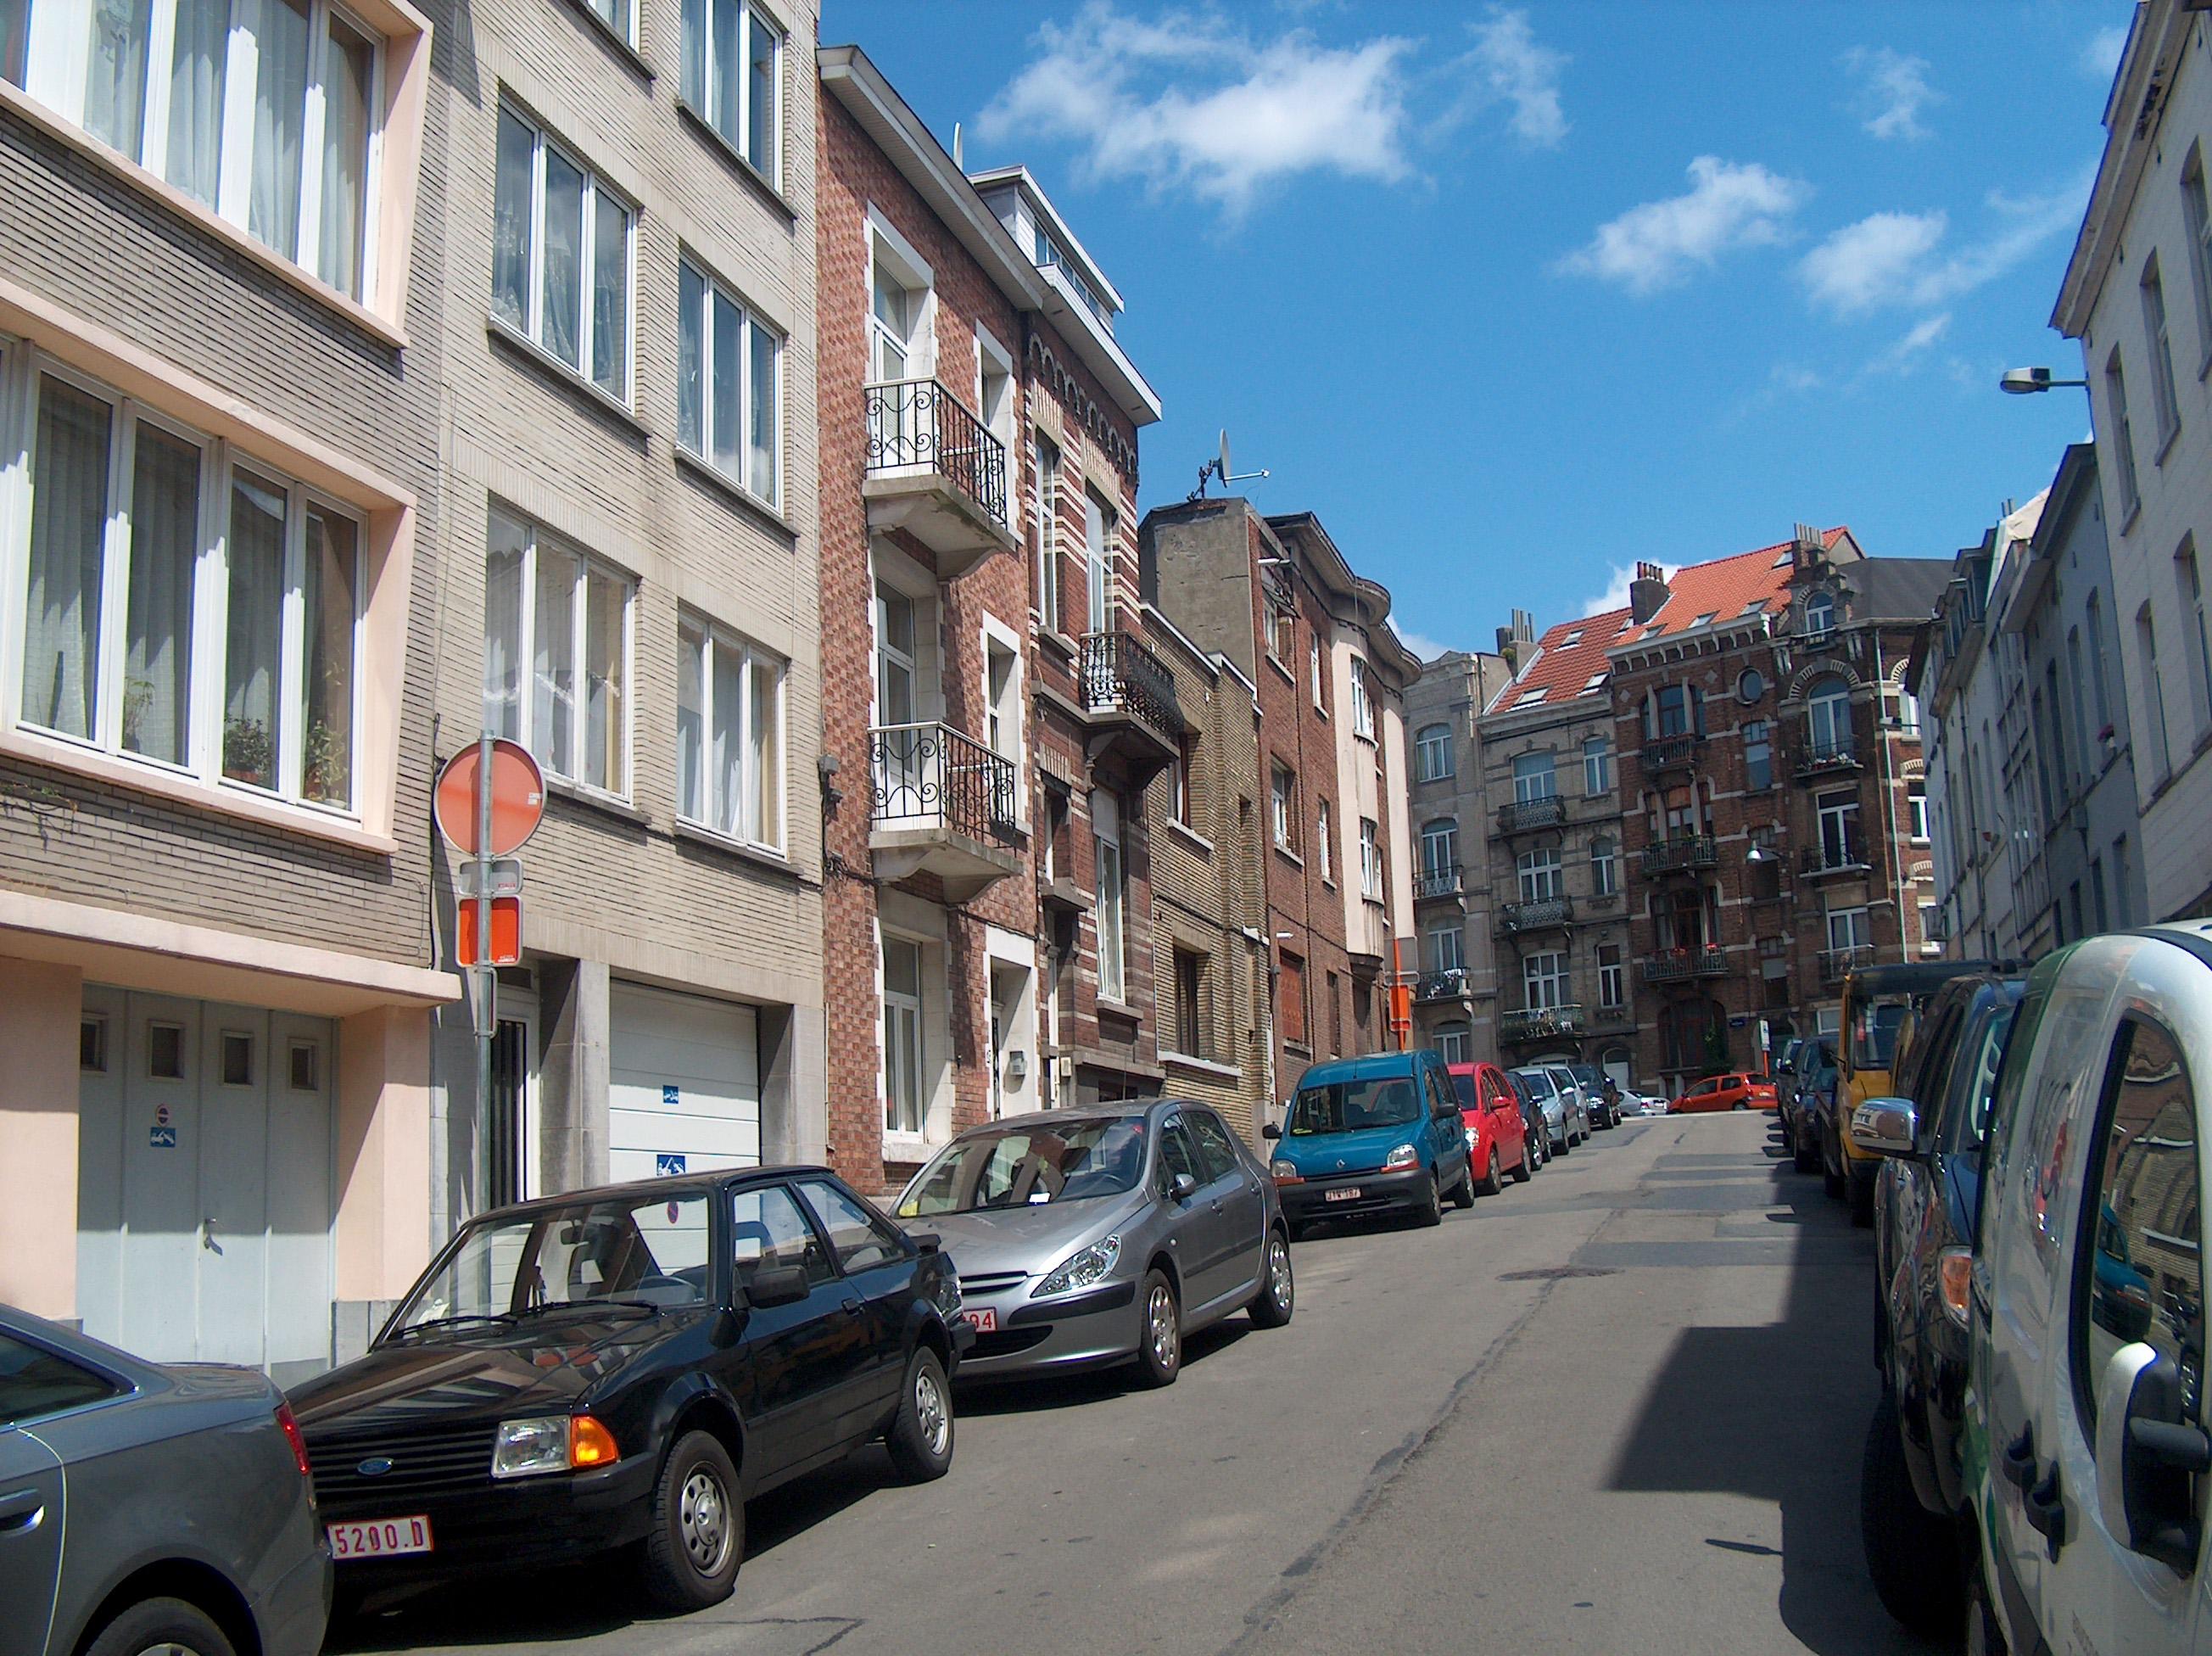 file schaerbeek saint josse ten noode rue de la cible 01. Black Bedroom Furniture Sets. Home Design Ideas